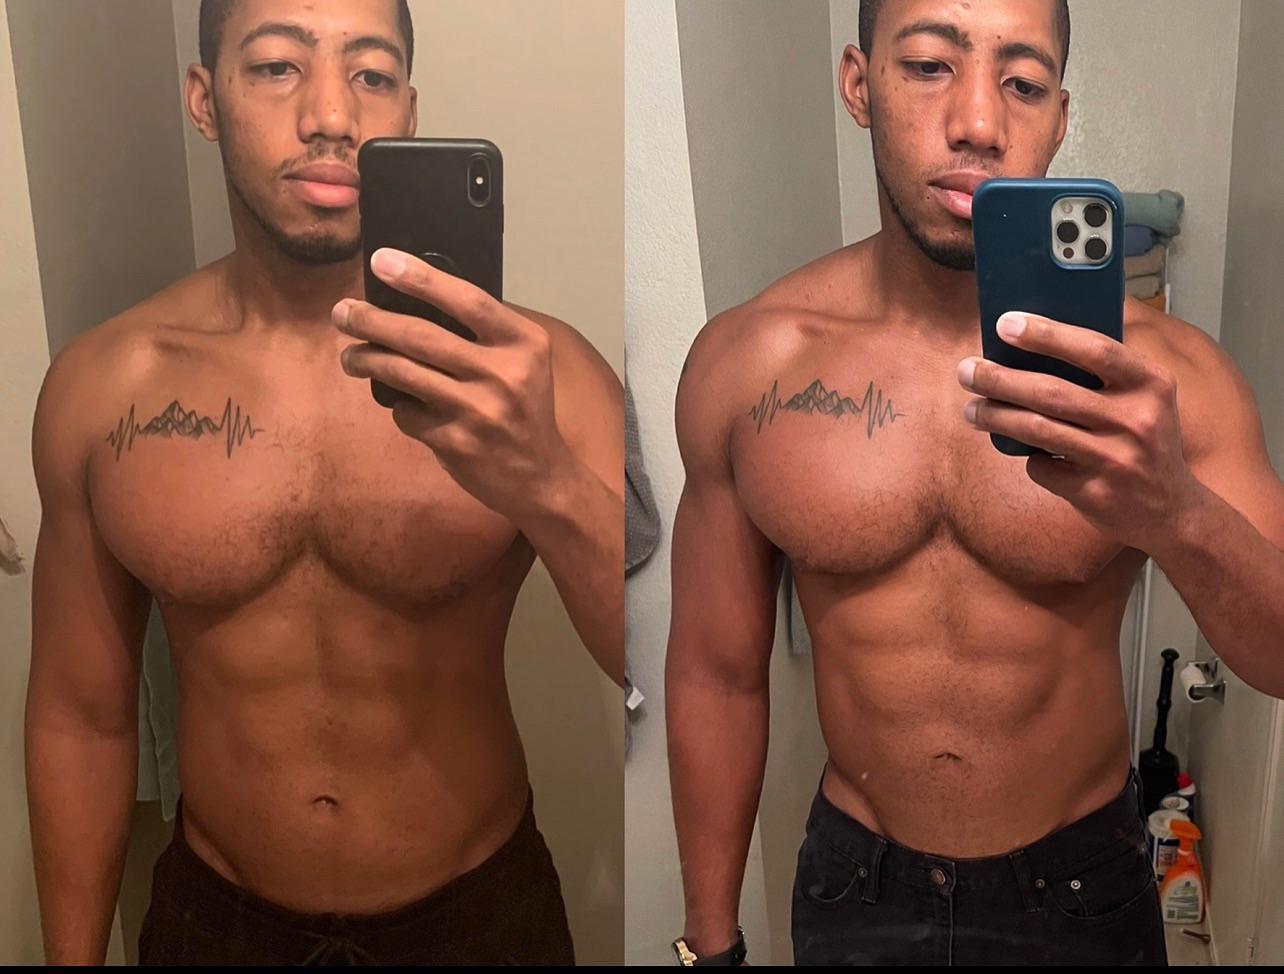 24 lbs Muscle Gain 6 foot Male 199 lbs to 223 lbs